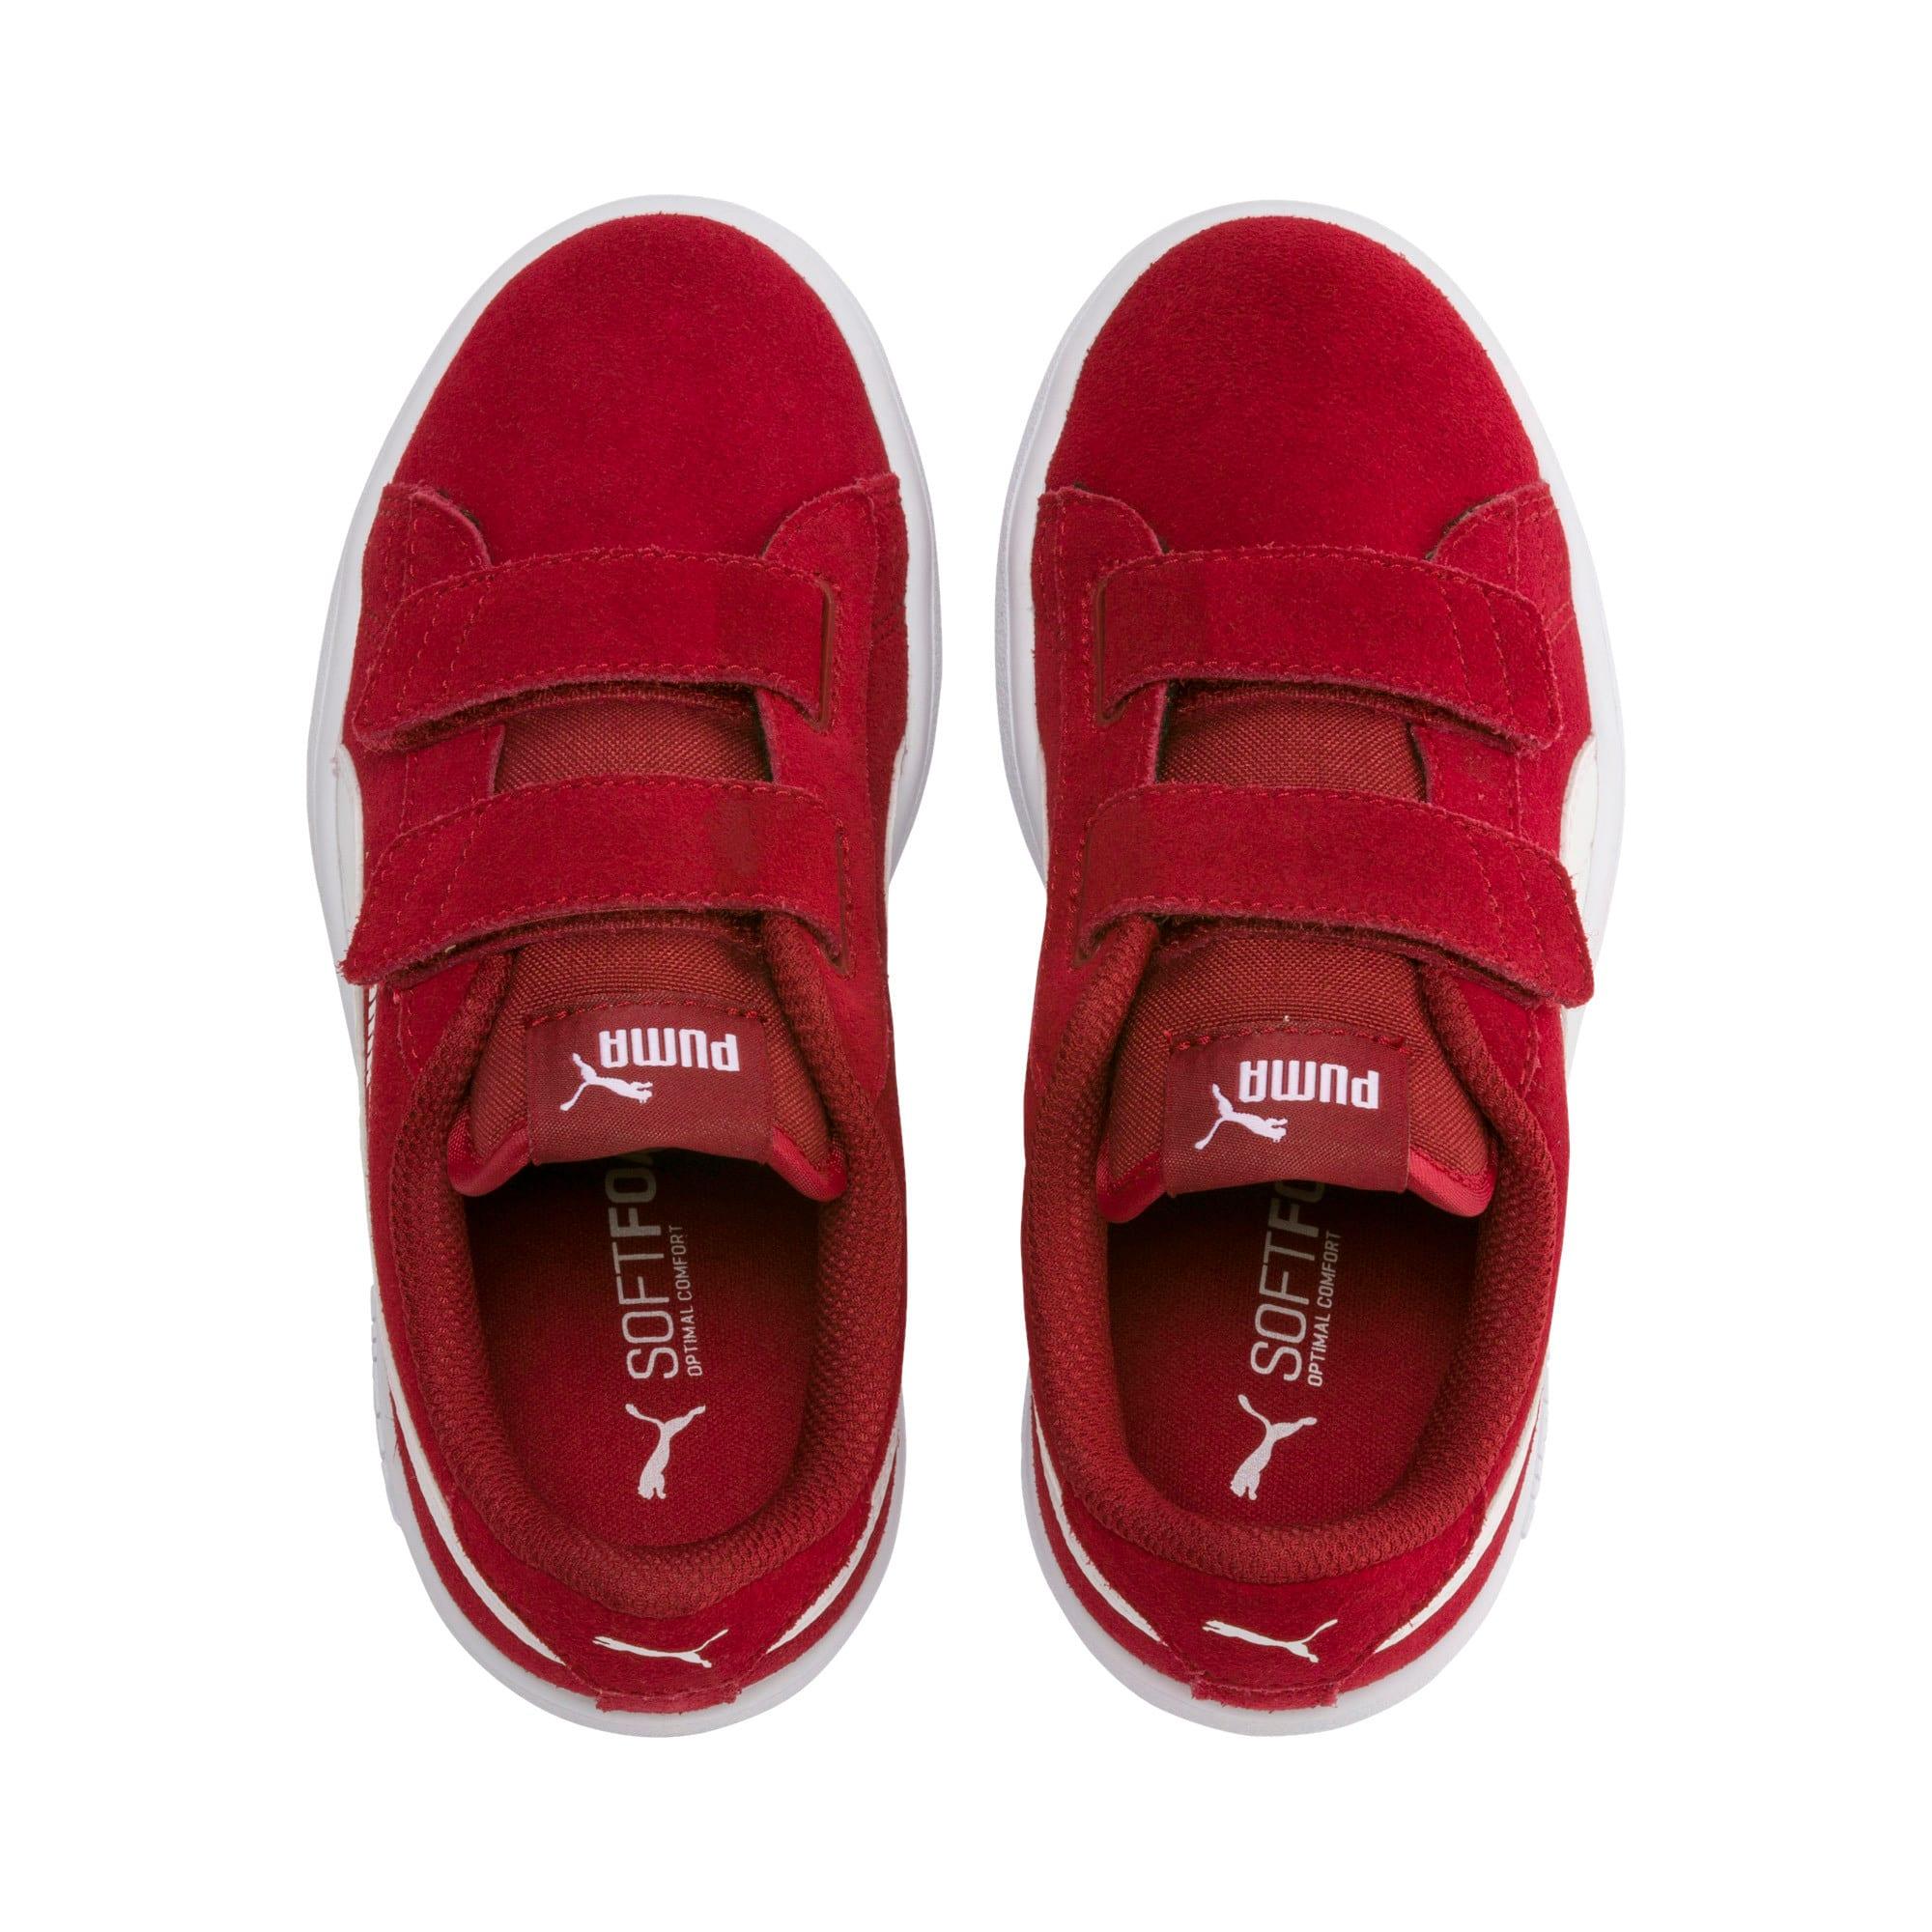 Thumbnail 6 of Smash v2 Suede Little Kids' Shoes, Rhubarb-Puma White, medium